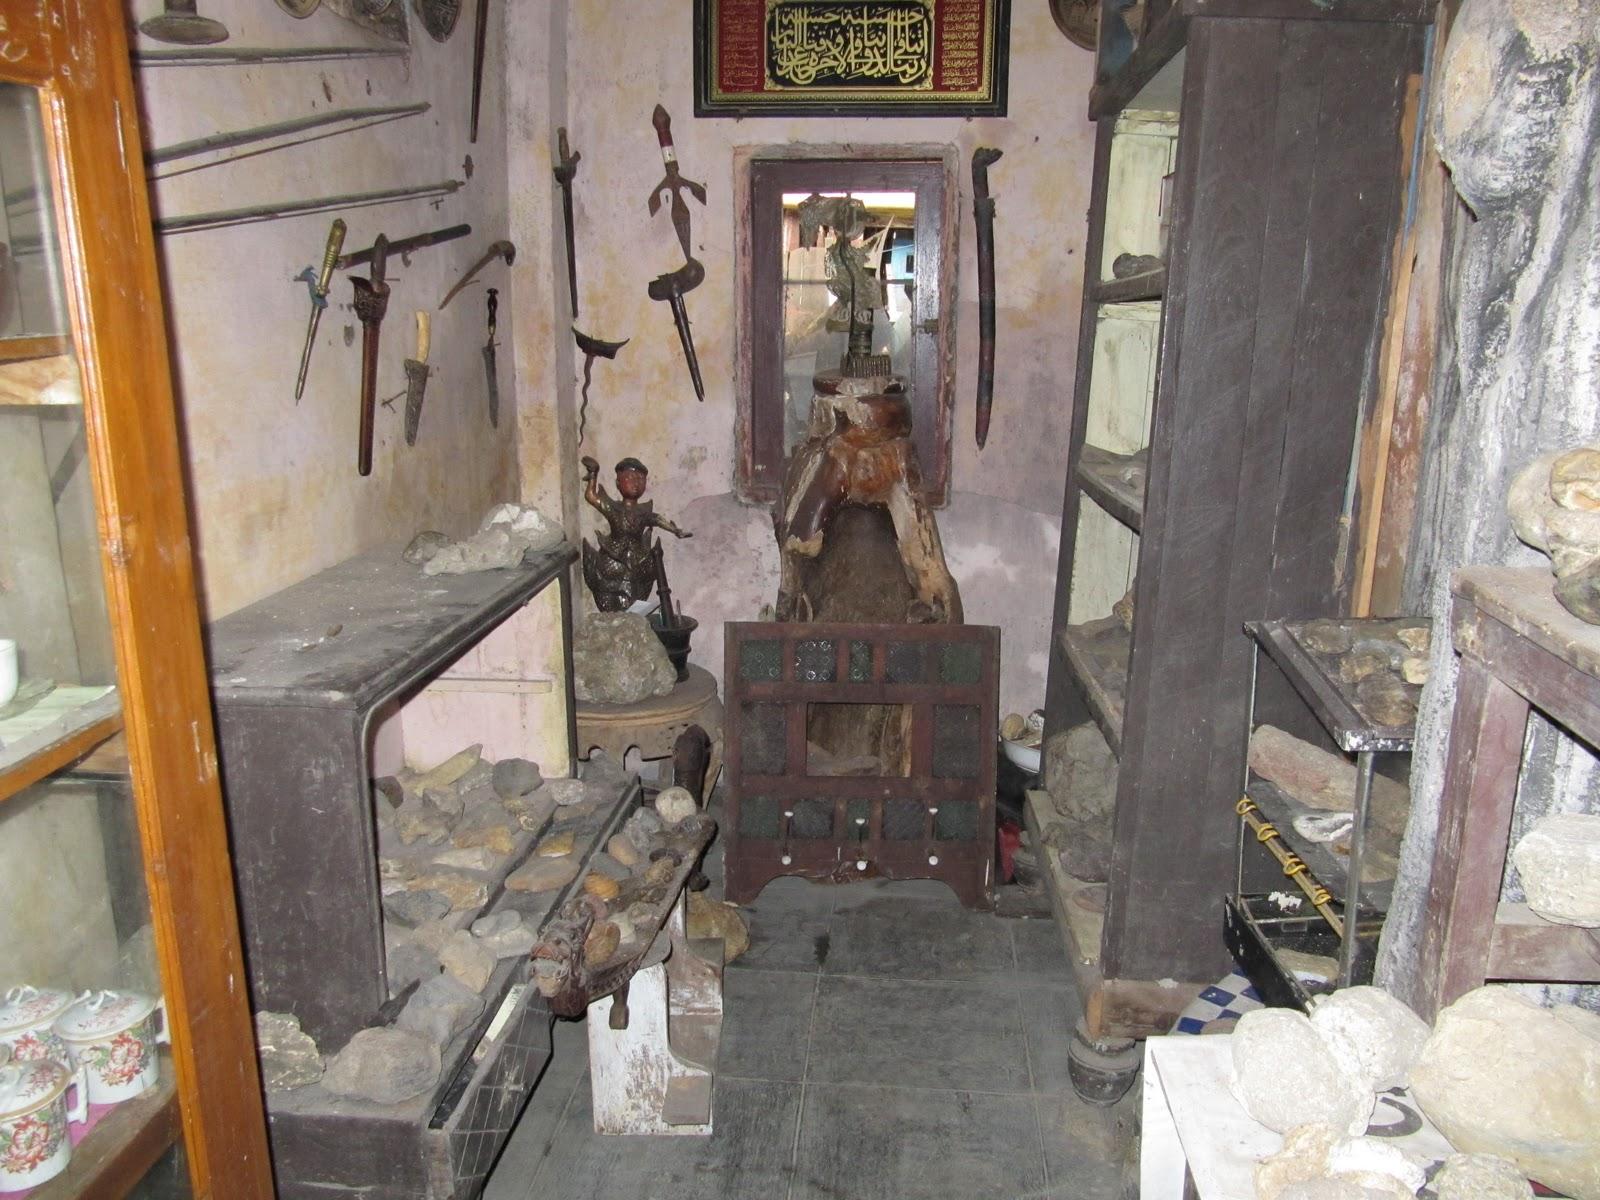 Pariwisata Museum Geologi Bandung Kab